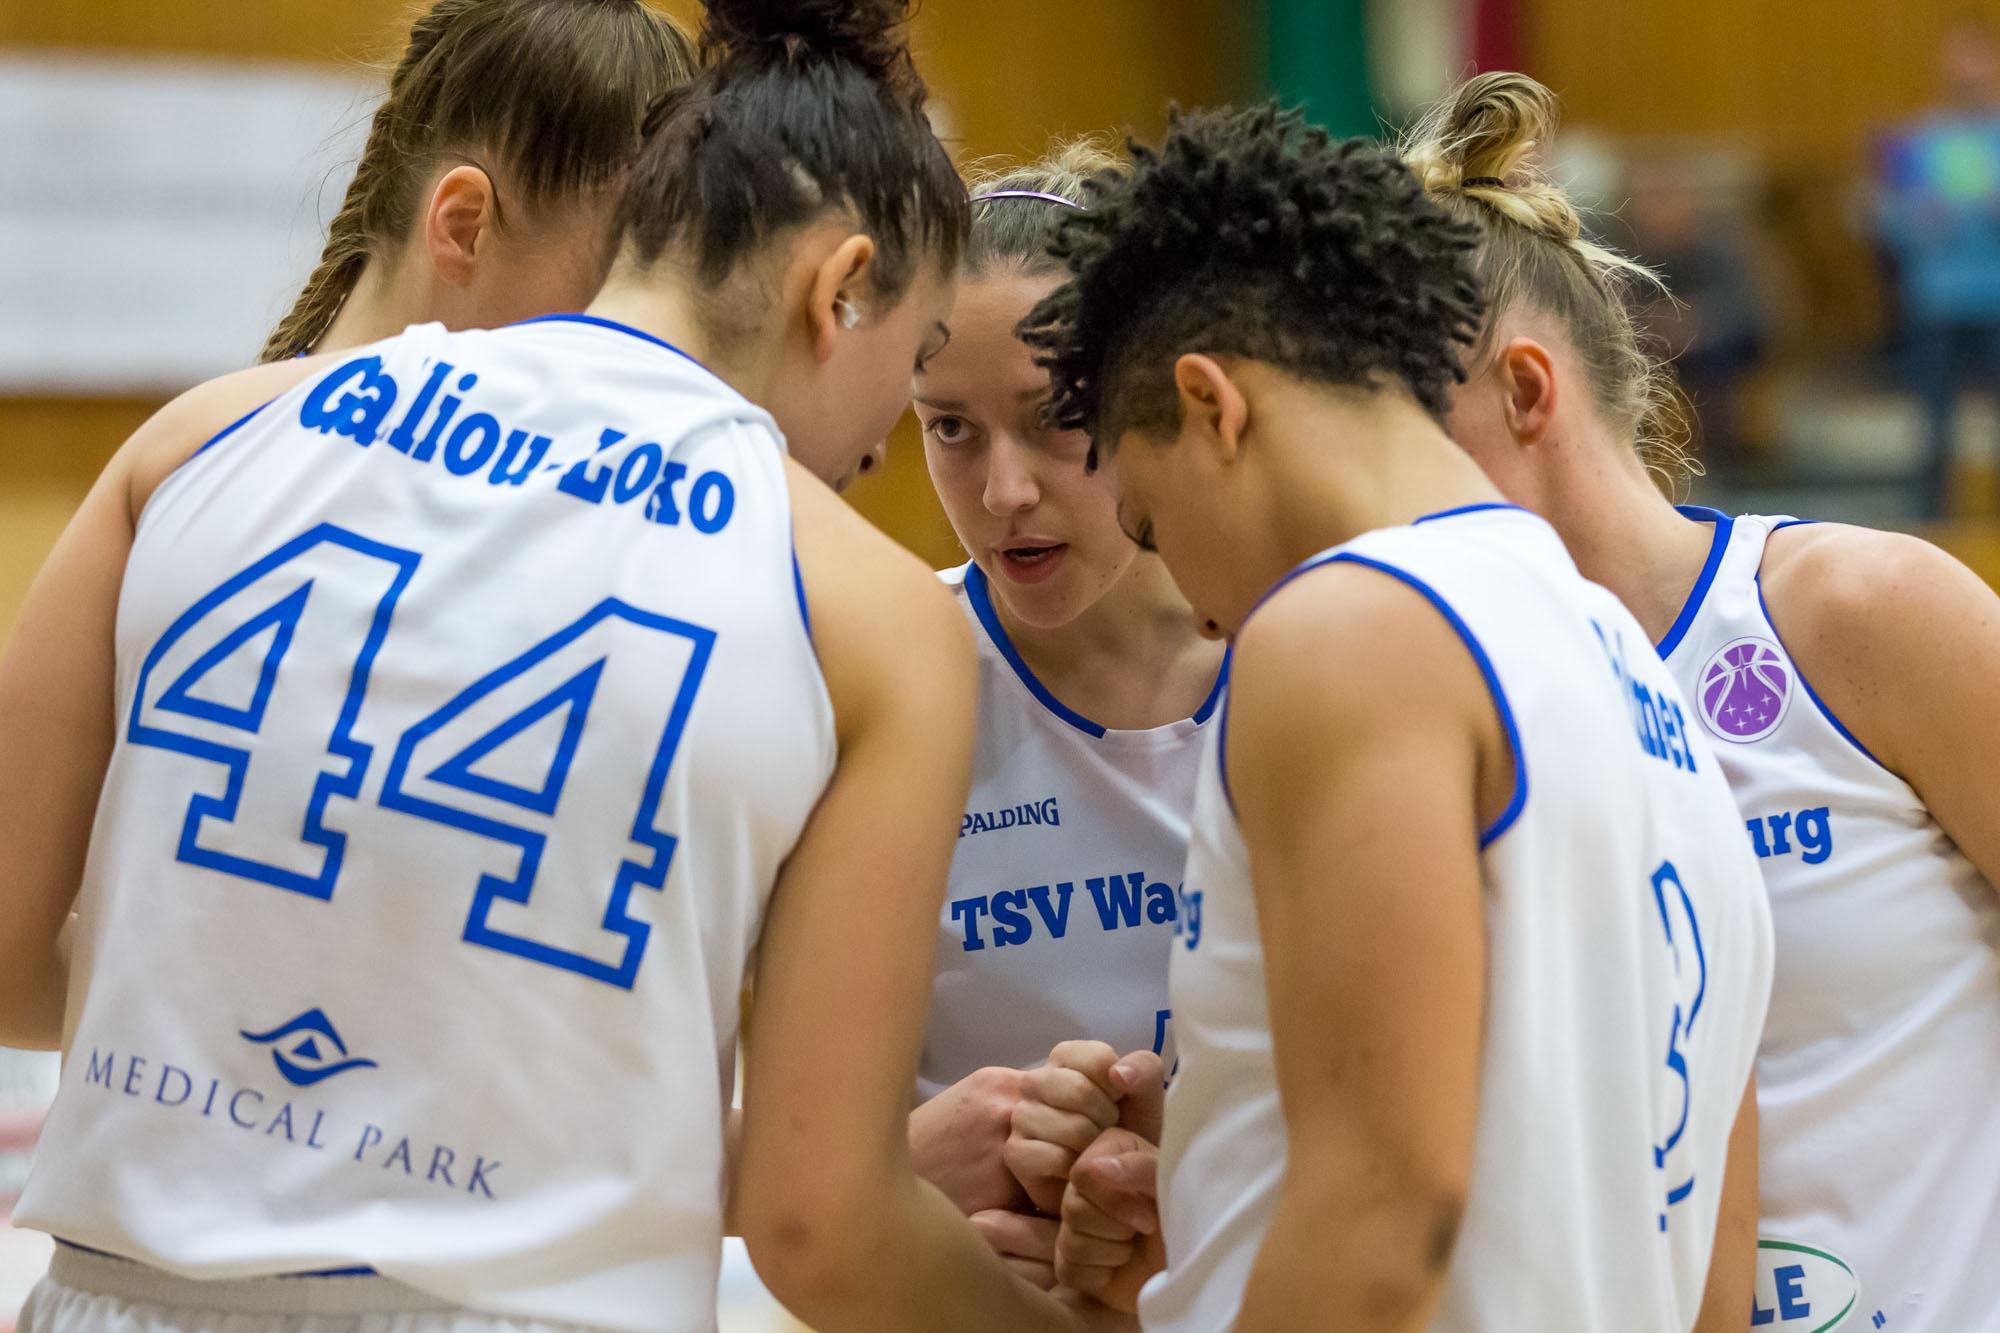 TSV Wasserburg Basketball Damen 1. Bundesliga DBBL Brei Werbetechnik Badria